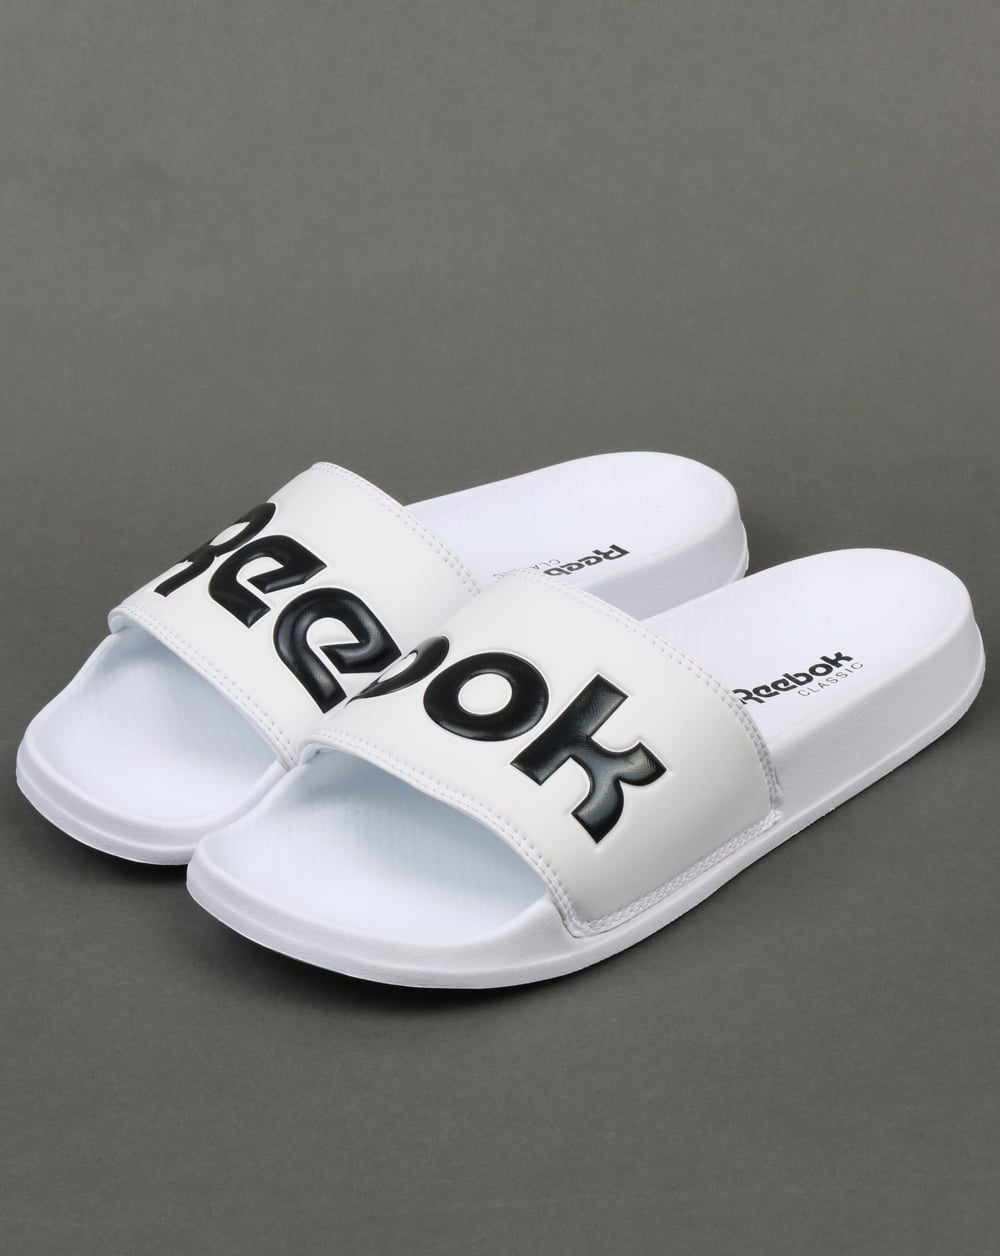 9e389735bba9e1 Reebok Reebok Classic Logo Sliders White